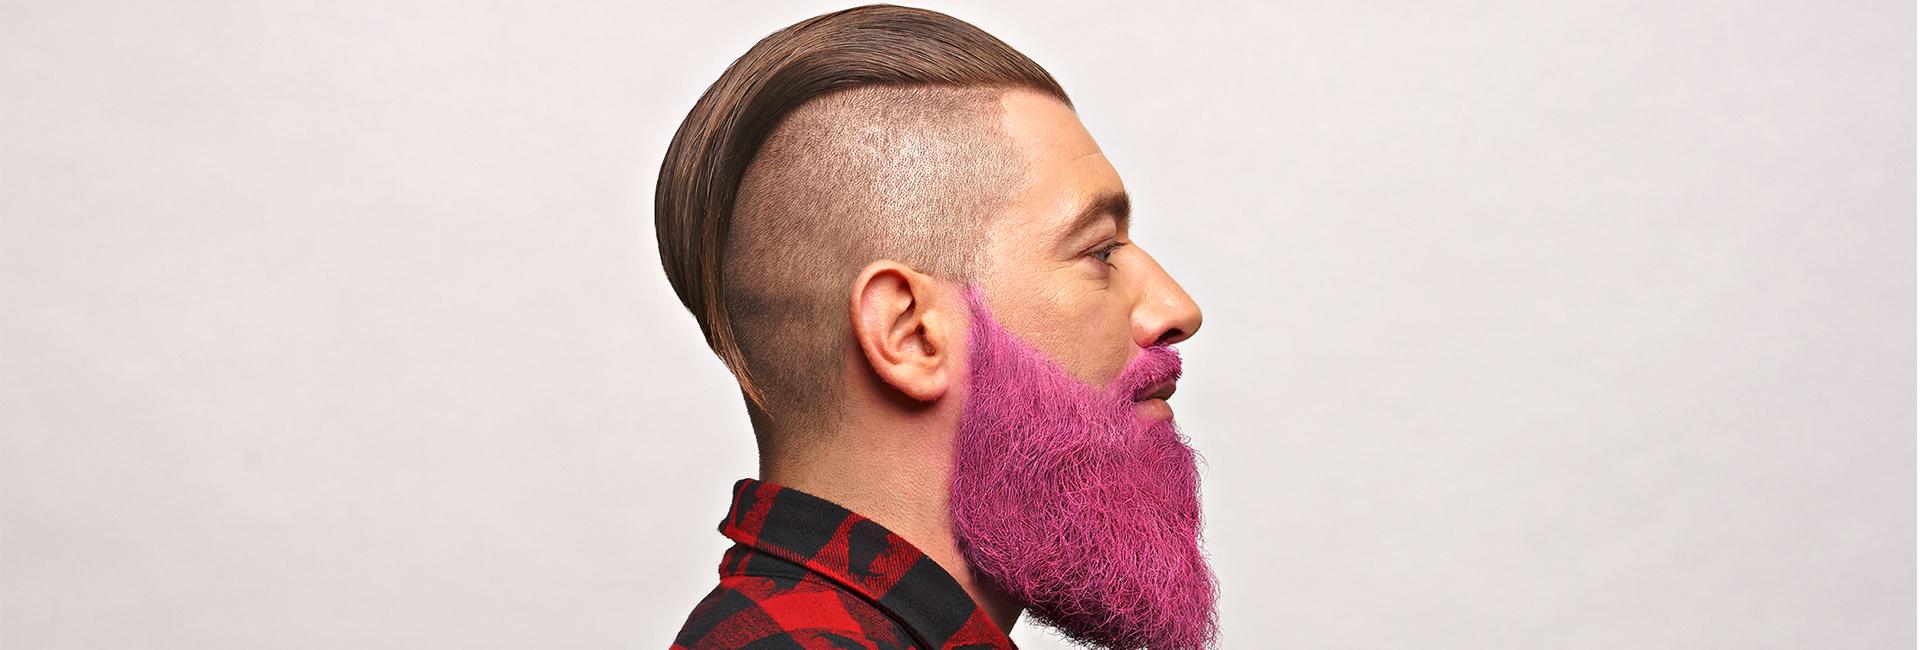 barbe-jordy-brechkoff-rose-blog-beaute-soin-parfum-homme